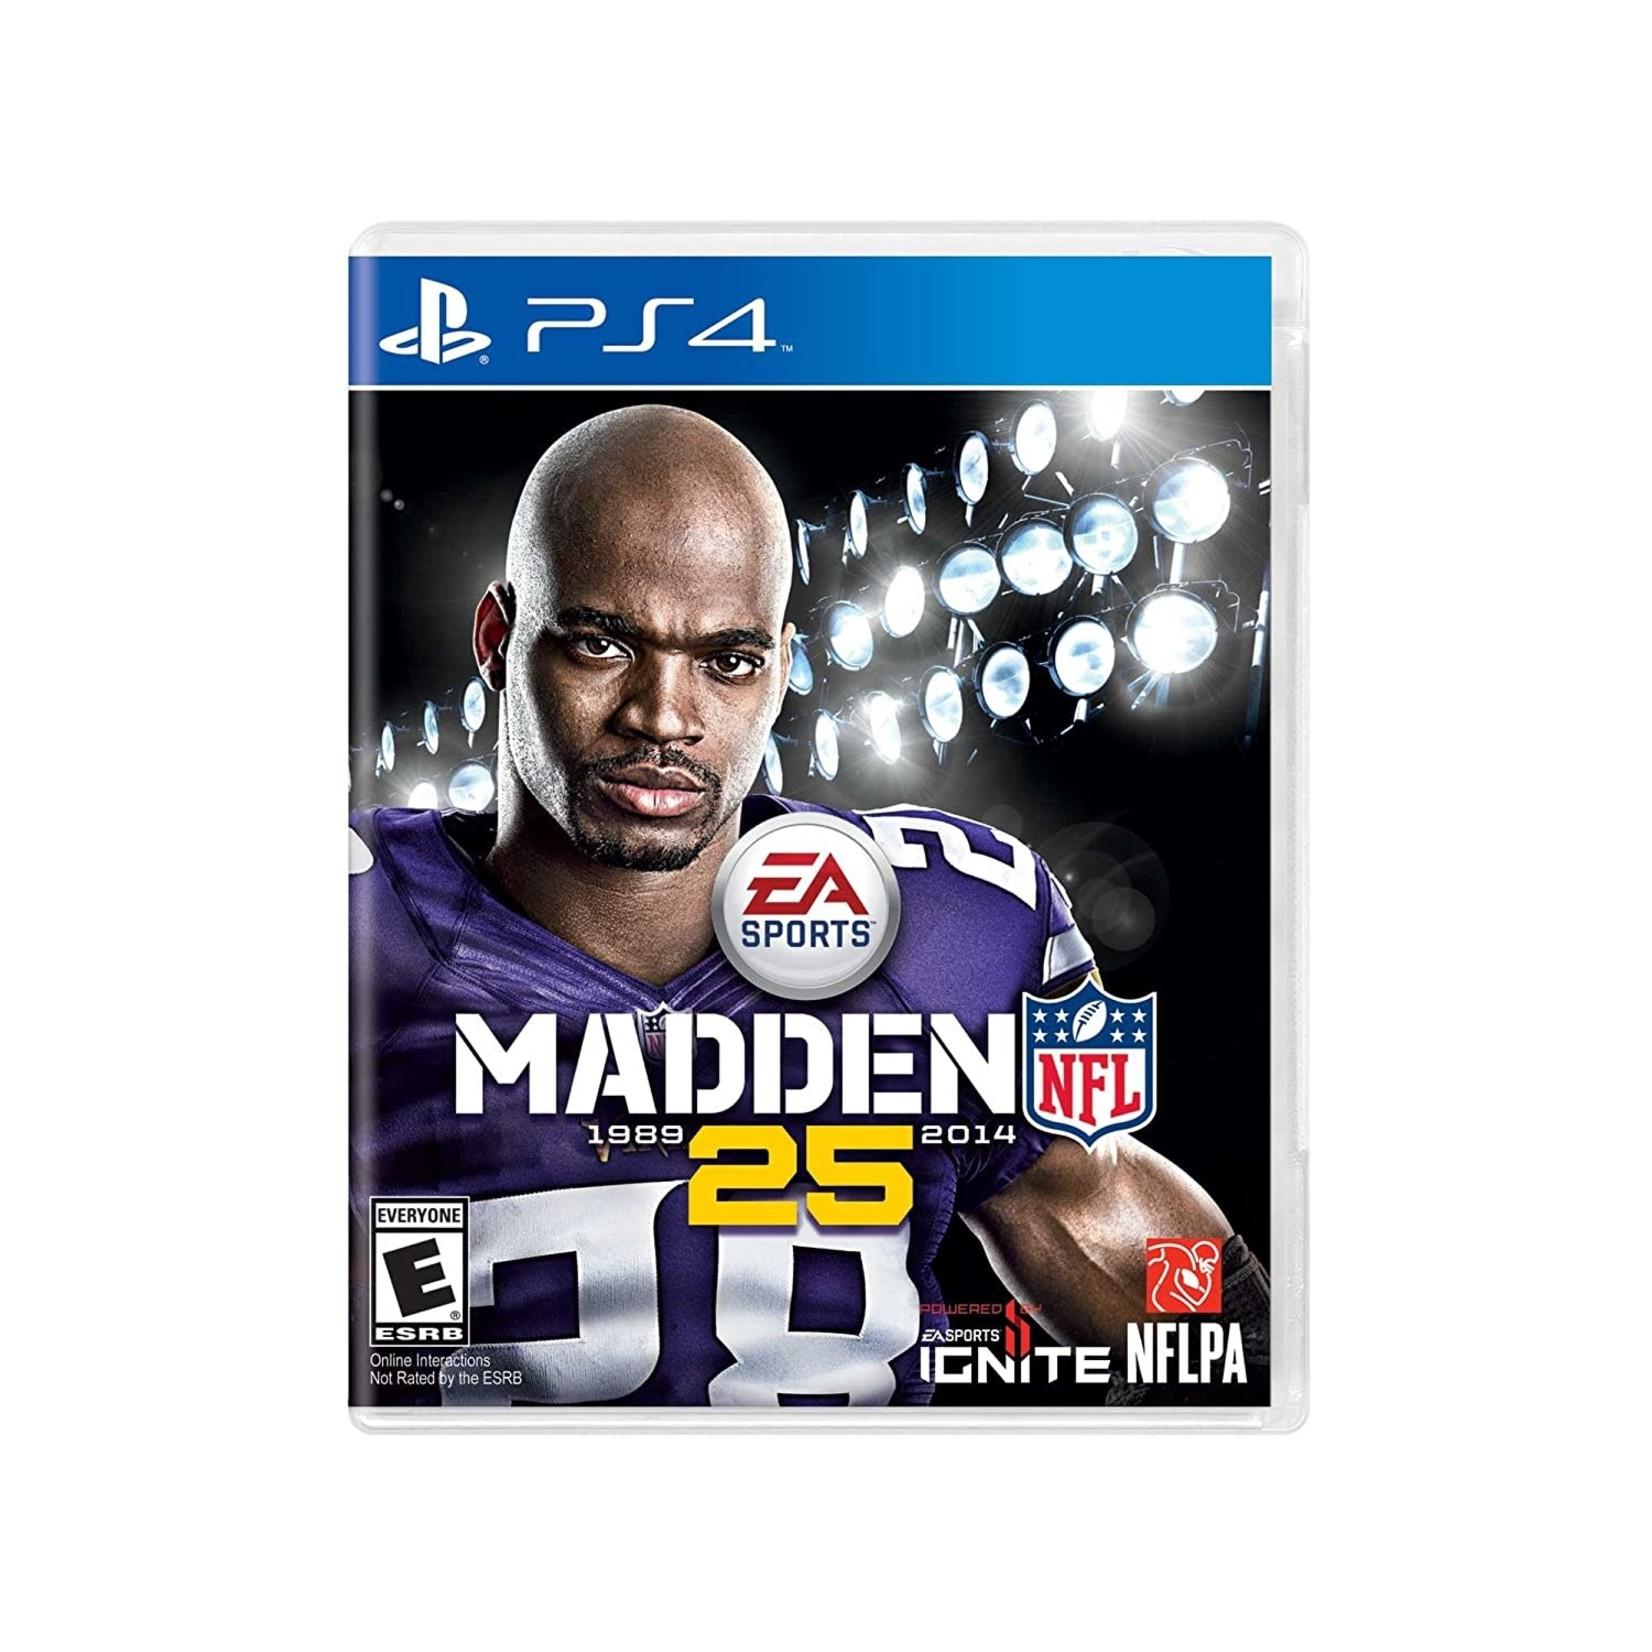 PS4U-Madden NFL 25